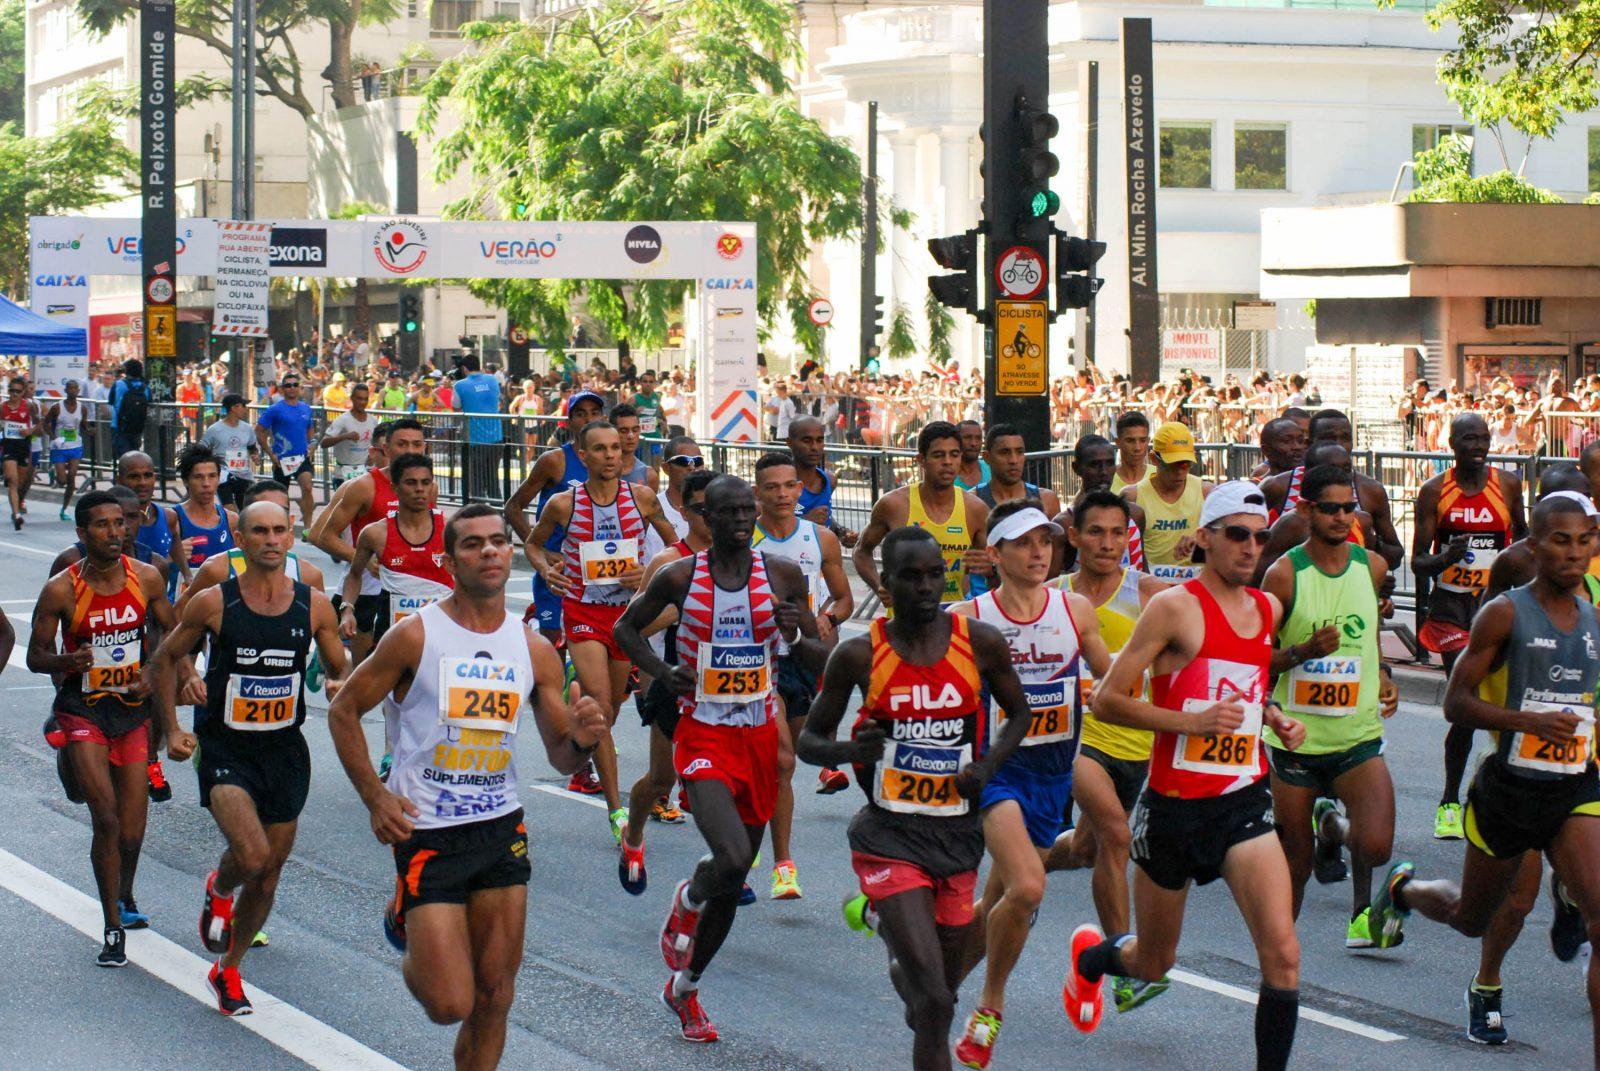 92 Sao Silvestre International Marathon-Sao Paulo